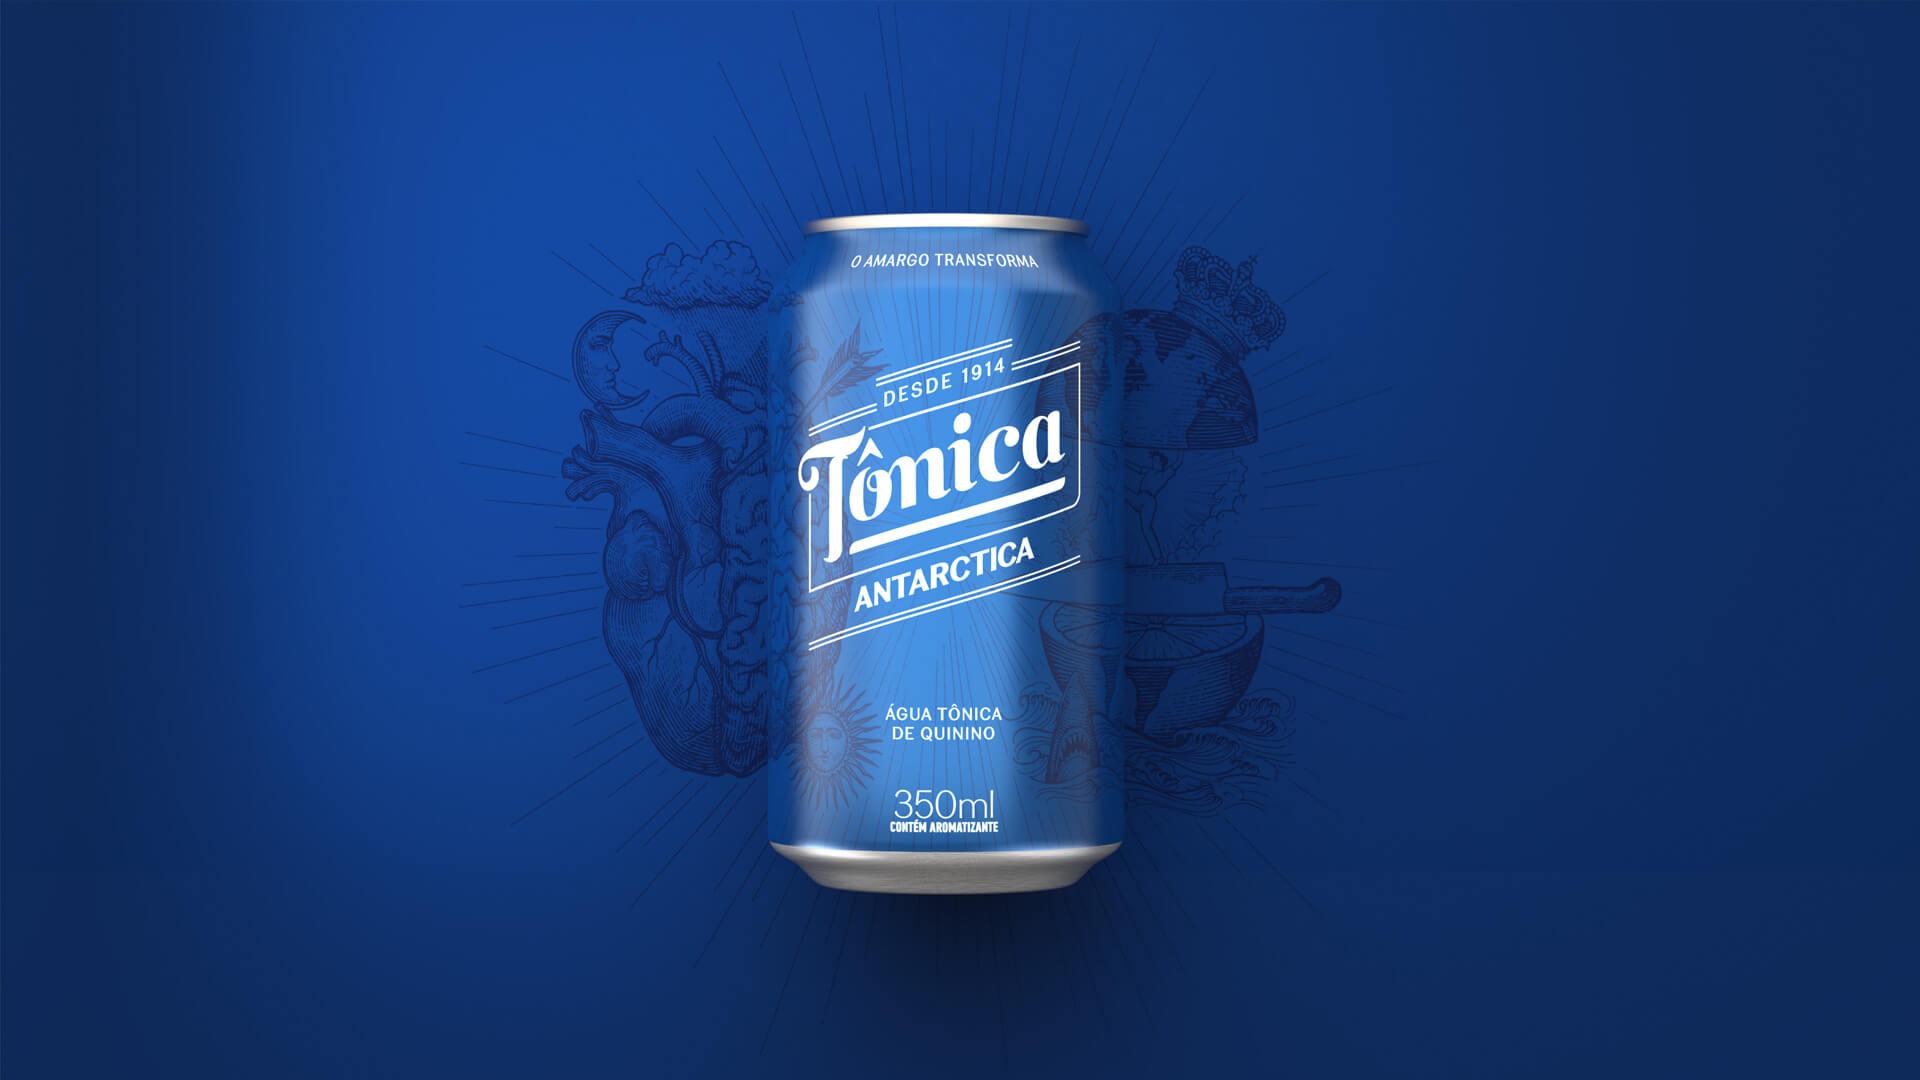 tonica-antartica